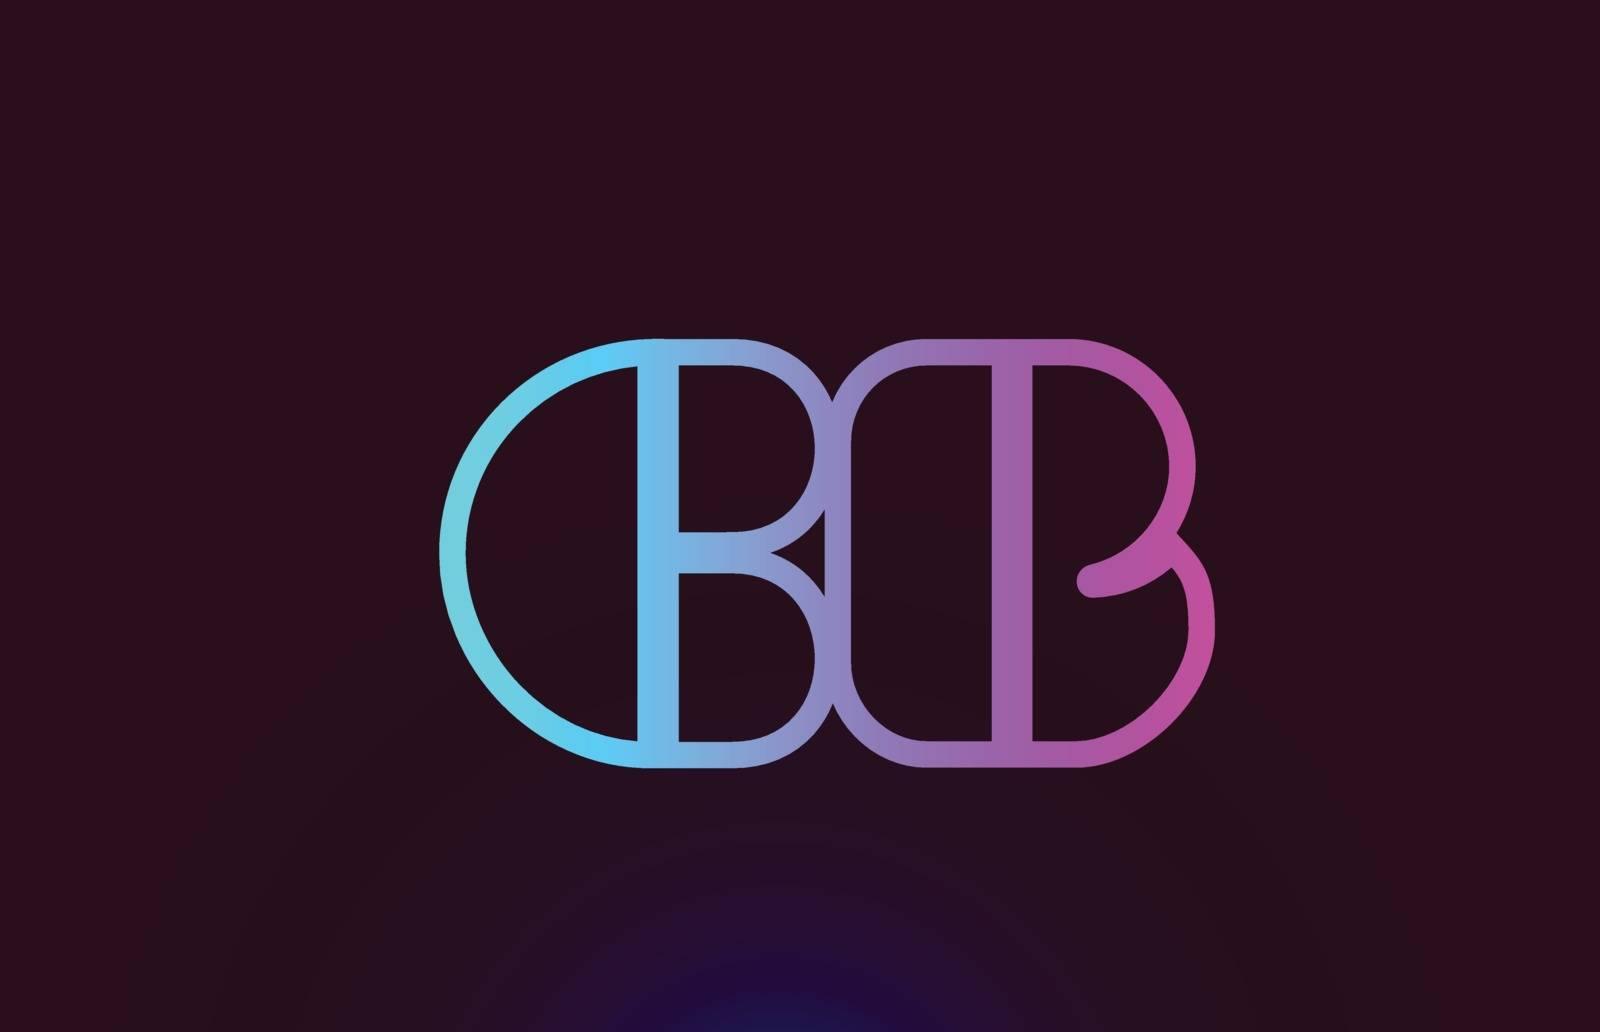 CB C B pink line alphabet letter combination logo icon design by dragomirescu